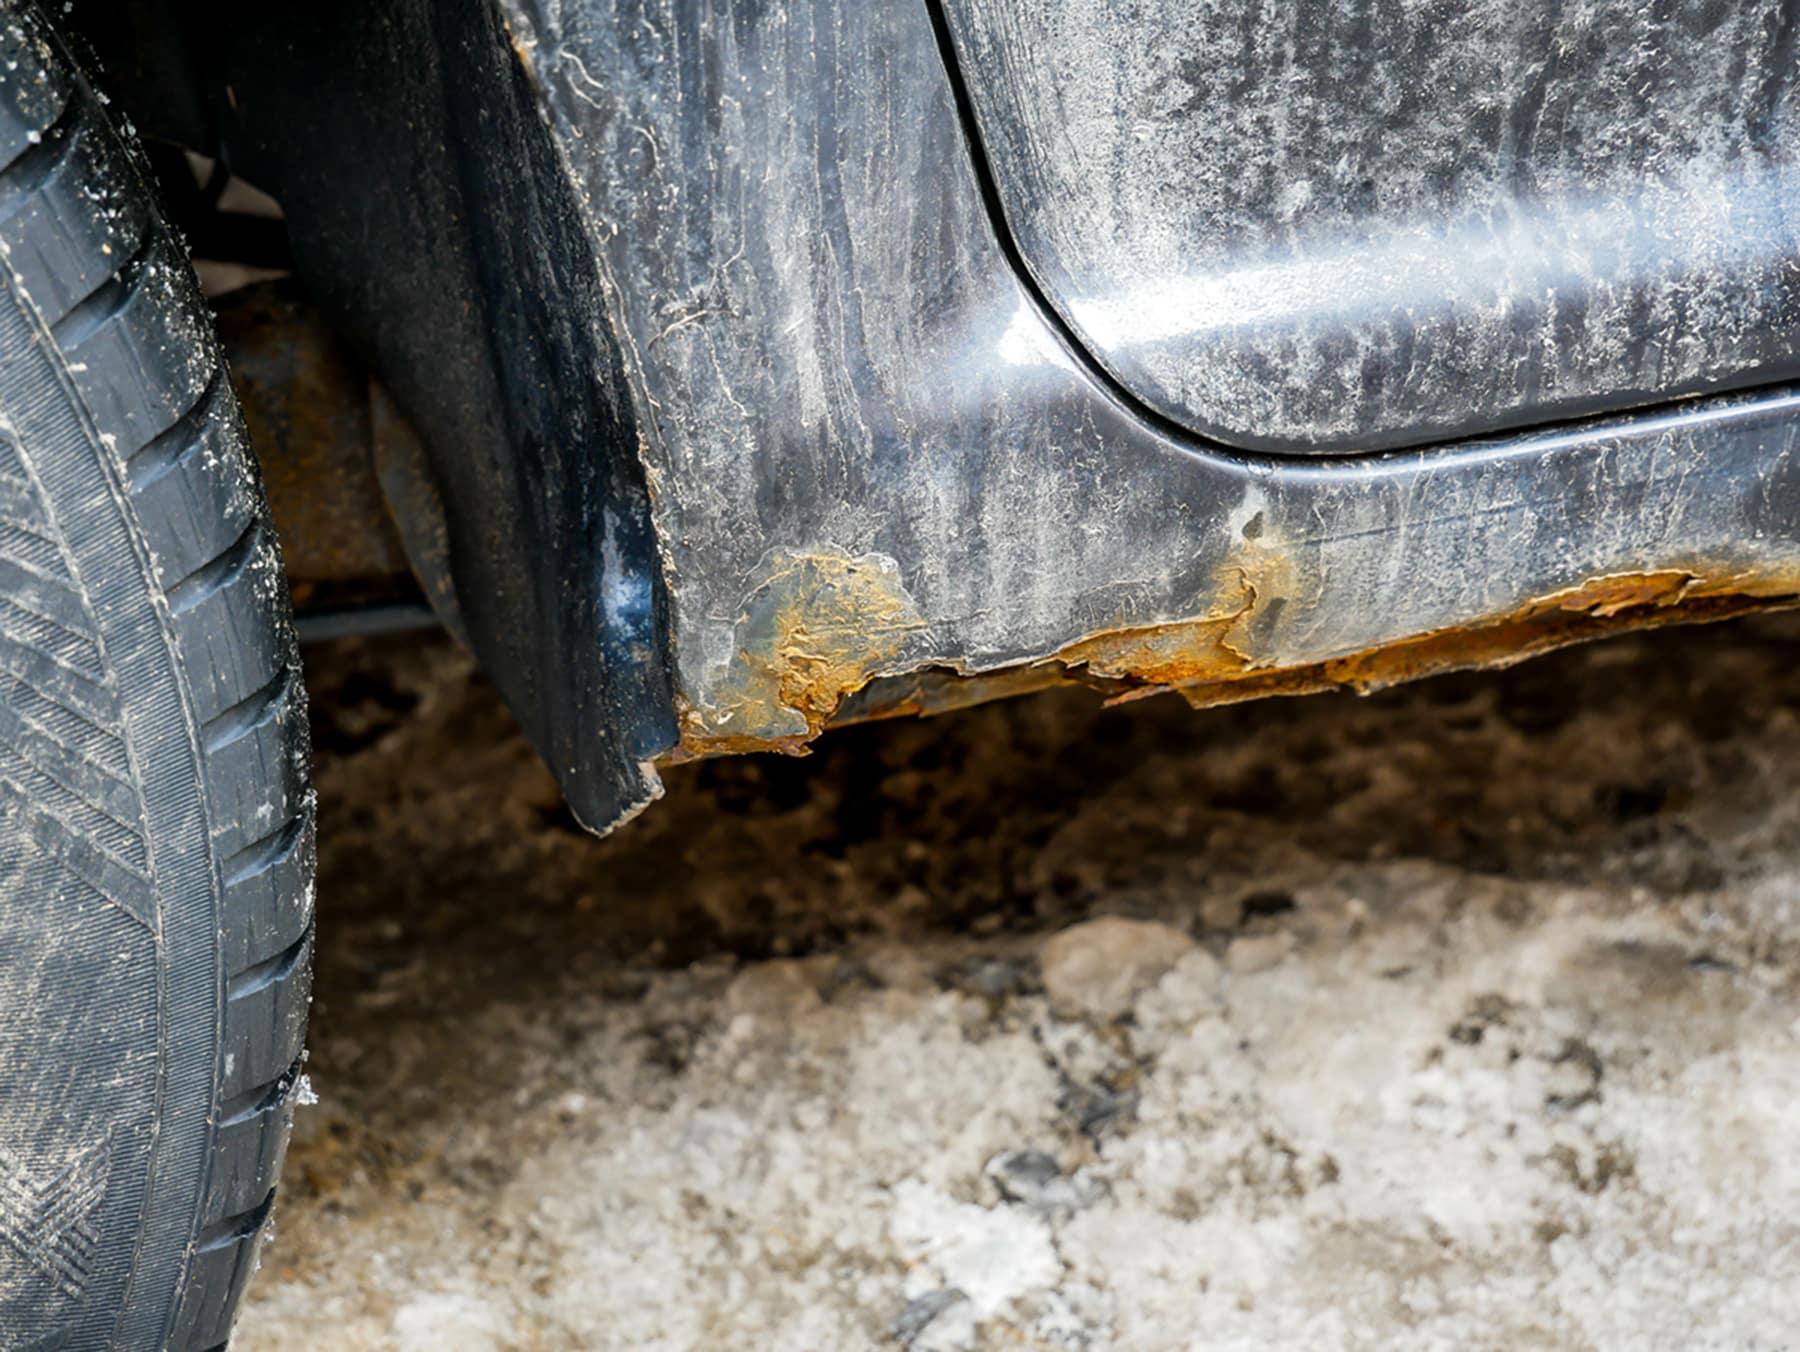 Rust Spots on Car